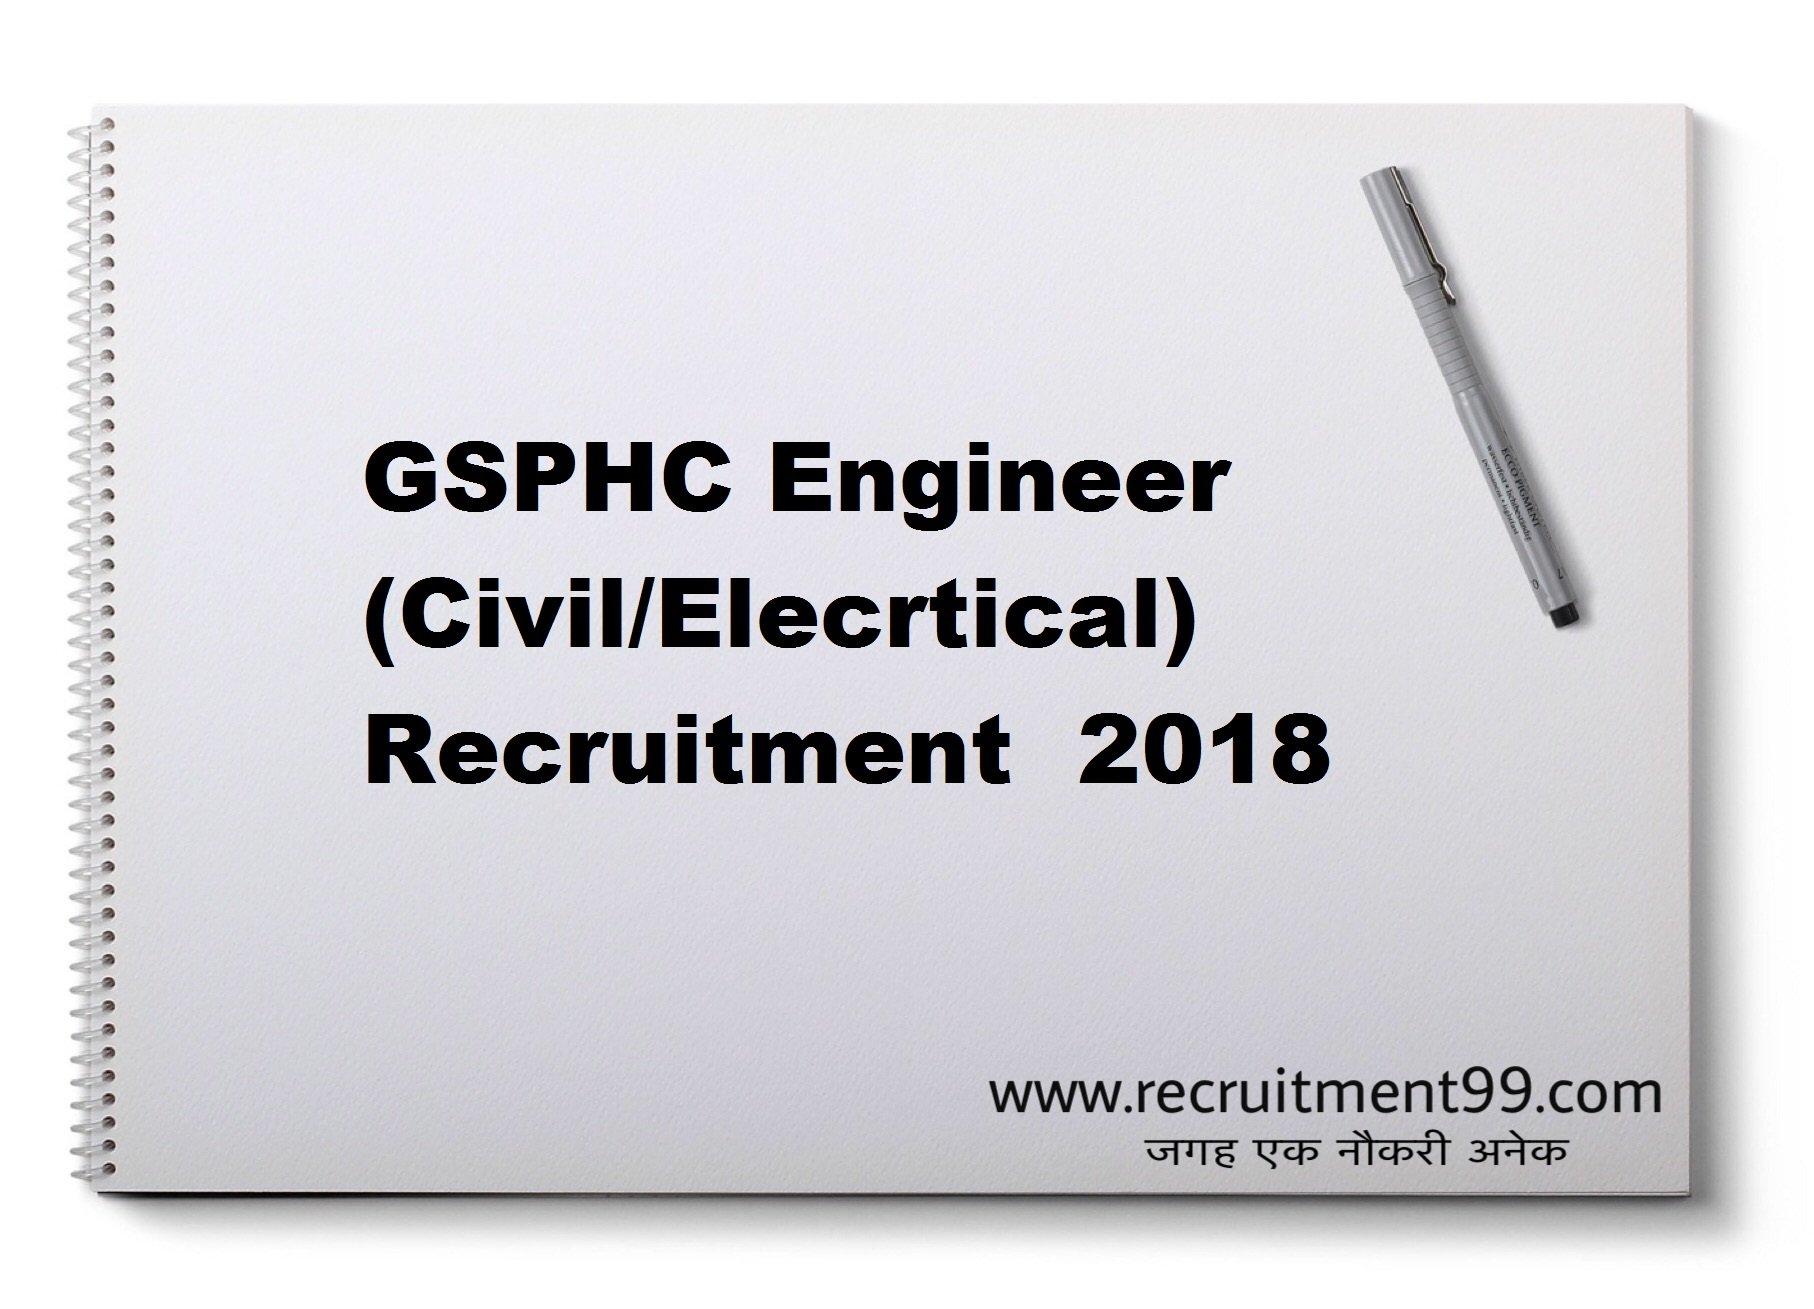 GSPHC Engineer Recruitment Admit Card Result 2018